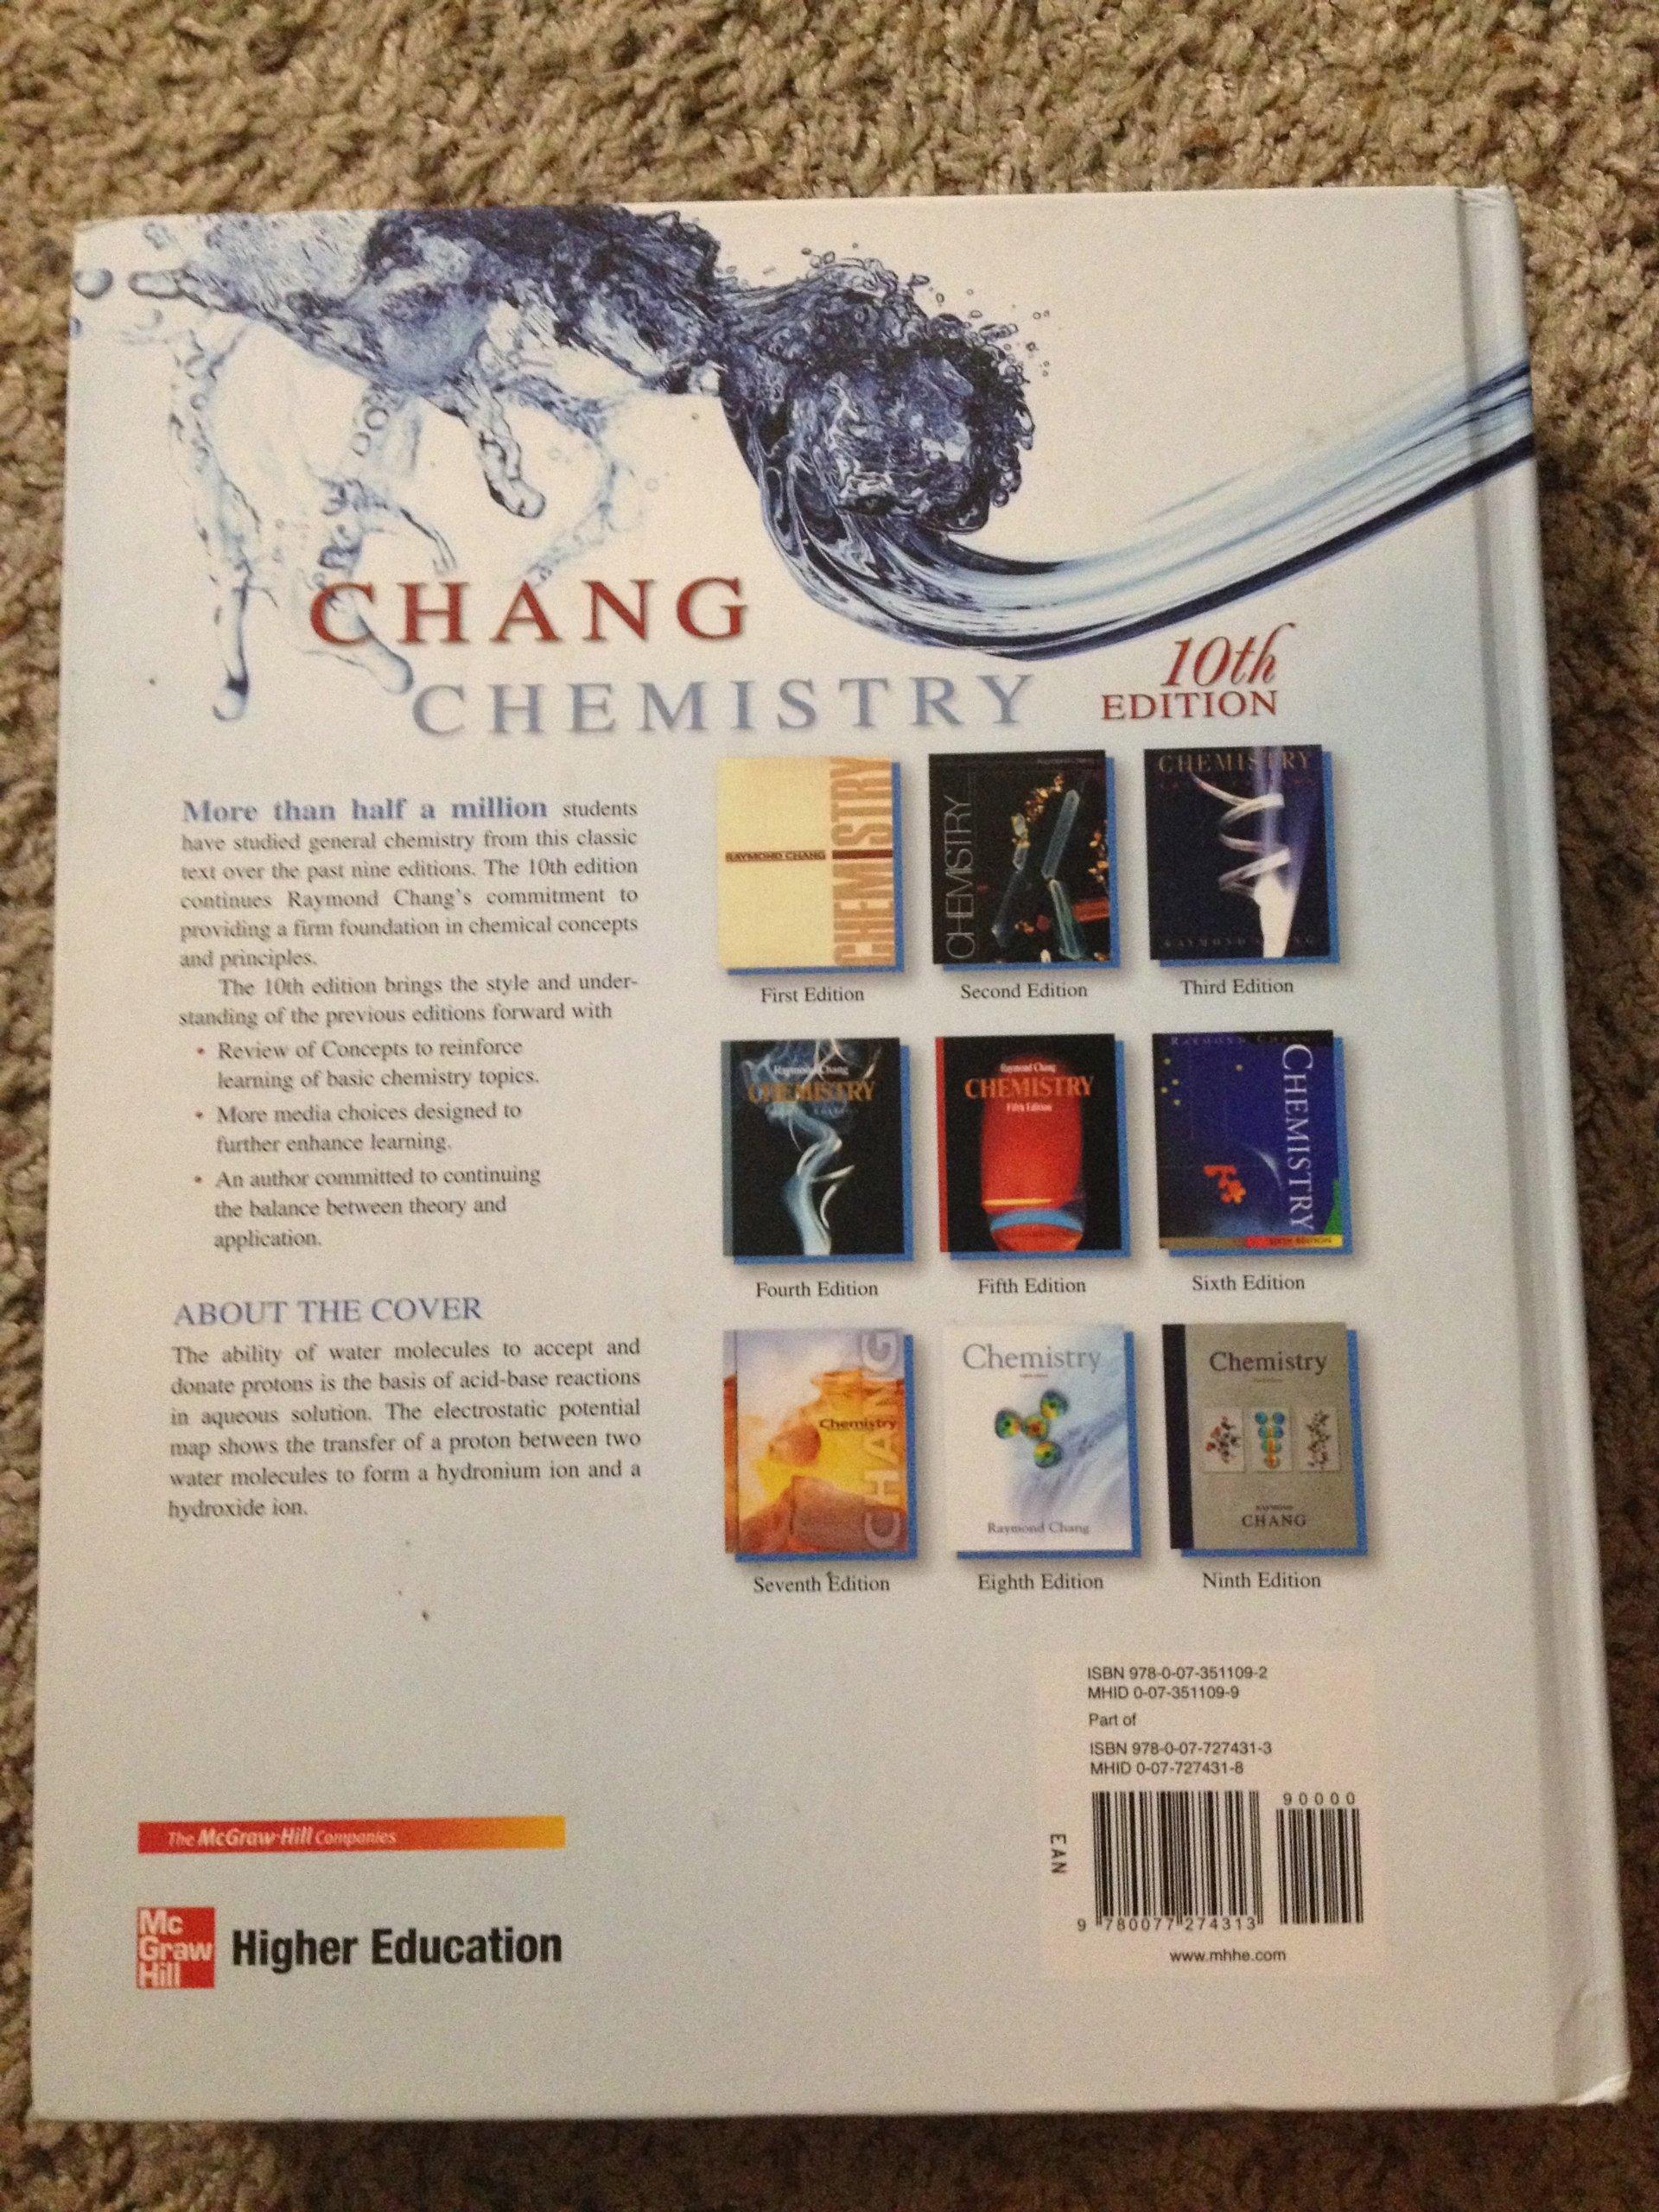 Chemistry 10th Edition (Chemistry 10th Edition): Raymond Chang:  9780077274313: Amazon.com: Books